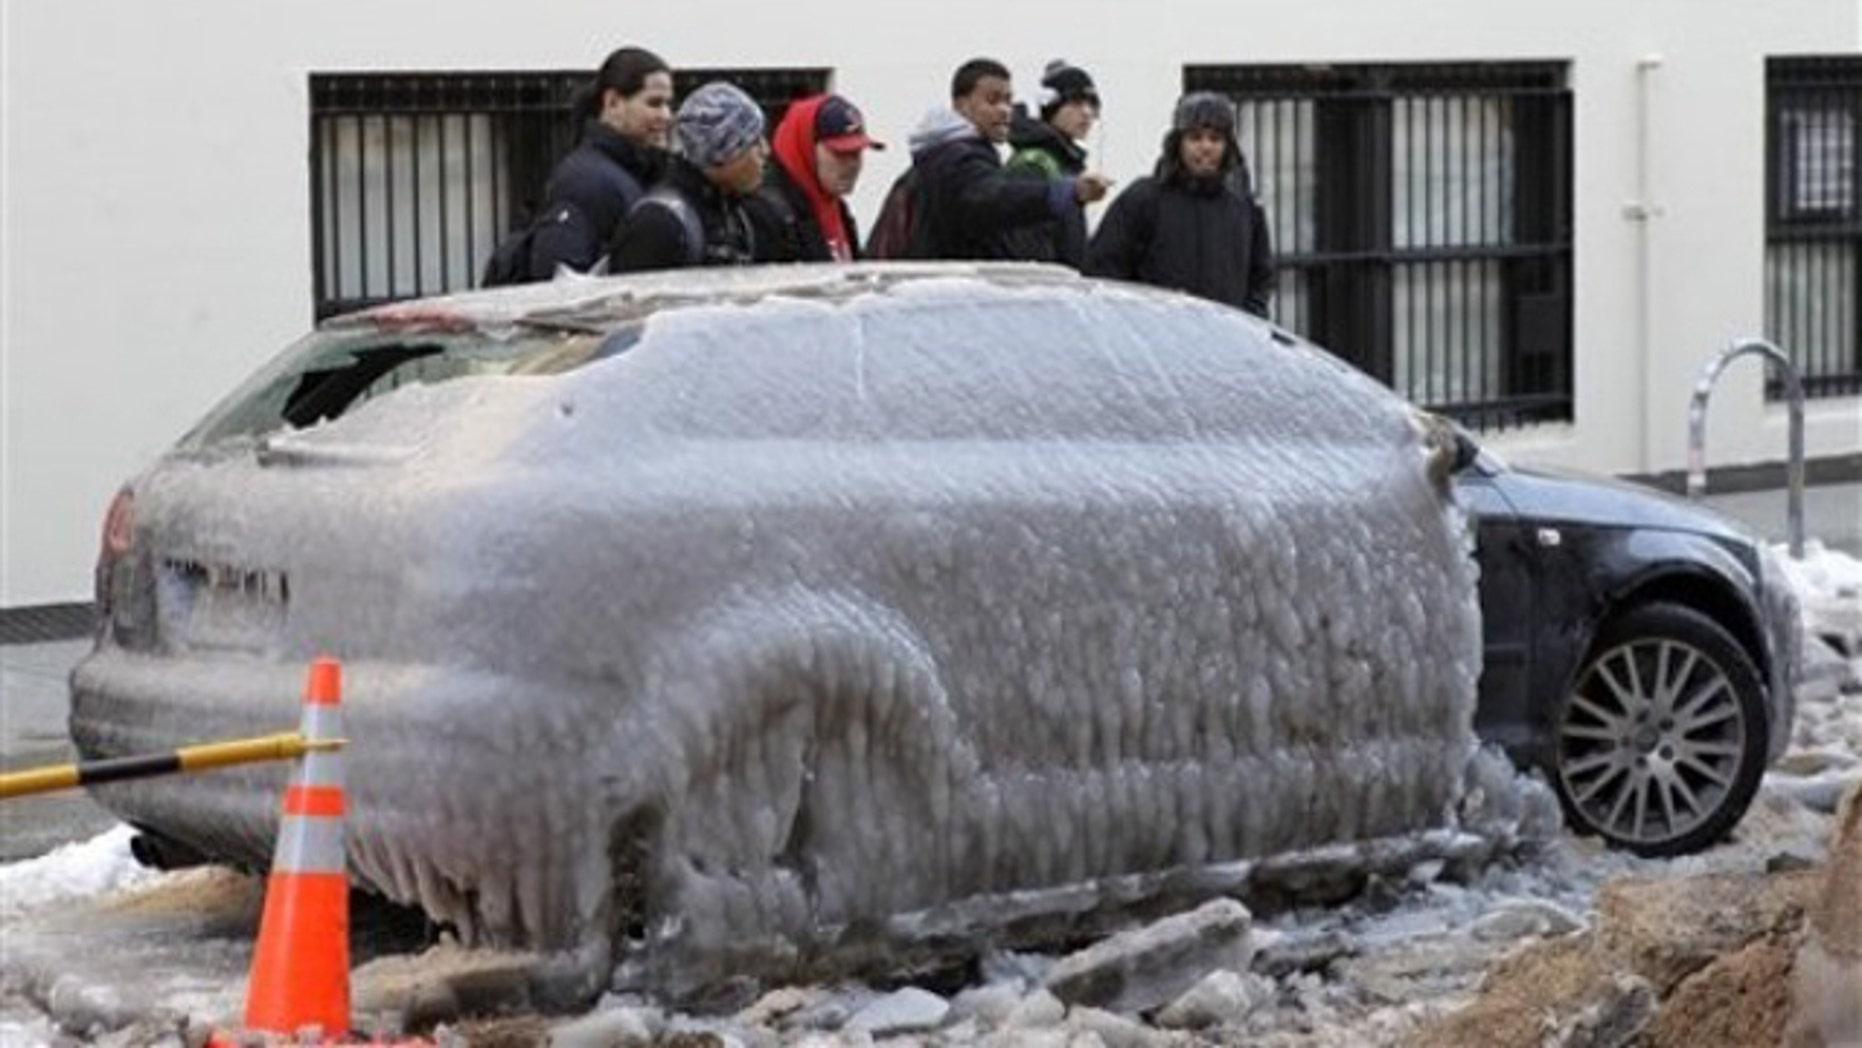 Jan. 24: Pedestrians gawk at Pete Helfer's car, frozen under a sheet of ice on a New York City street after a water pipe broke nearby (AP).